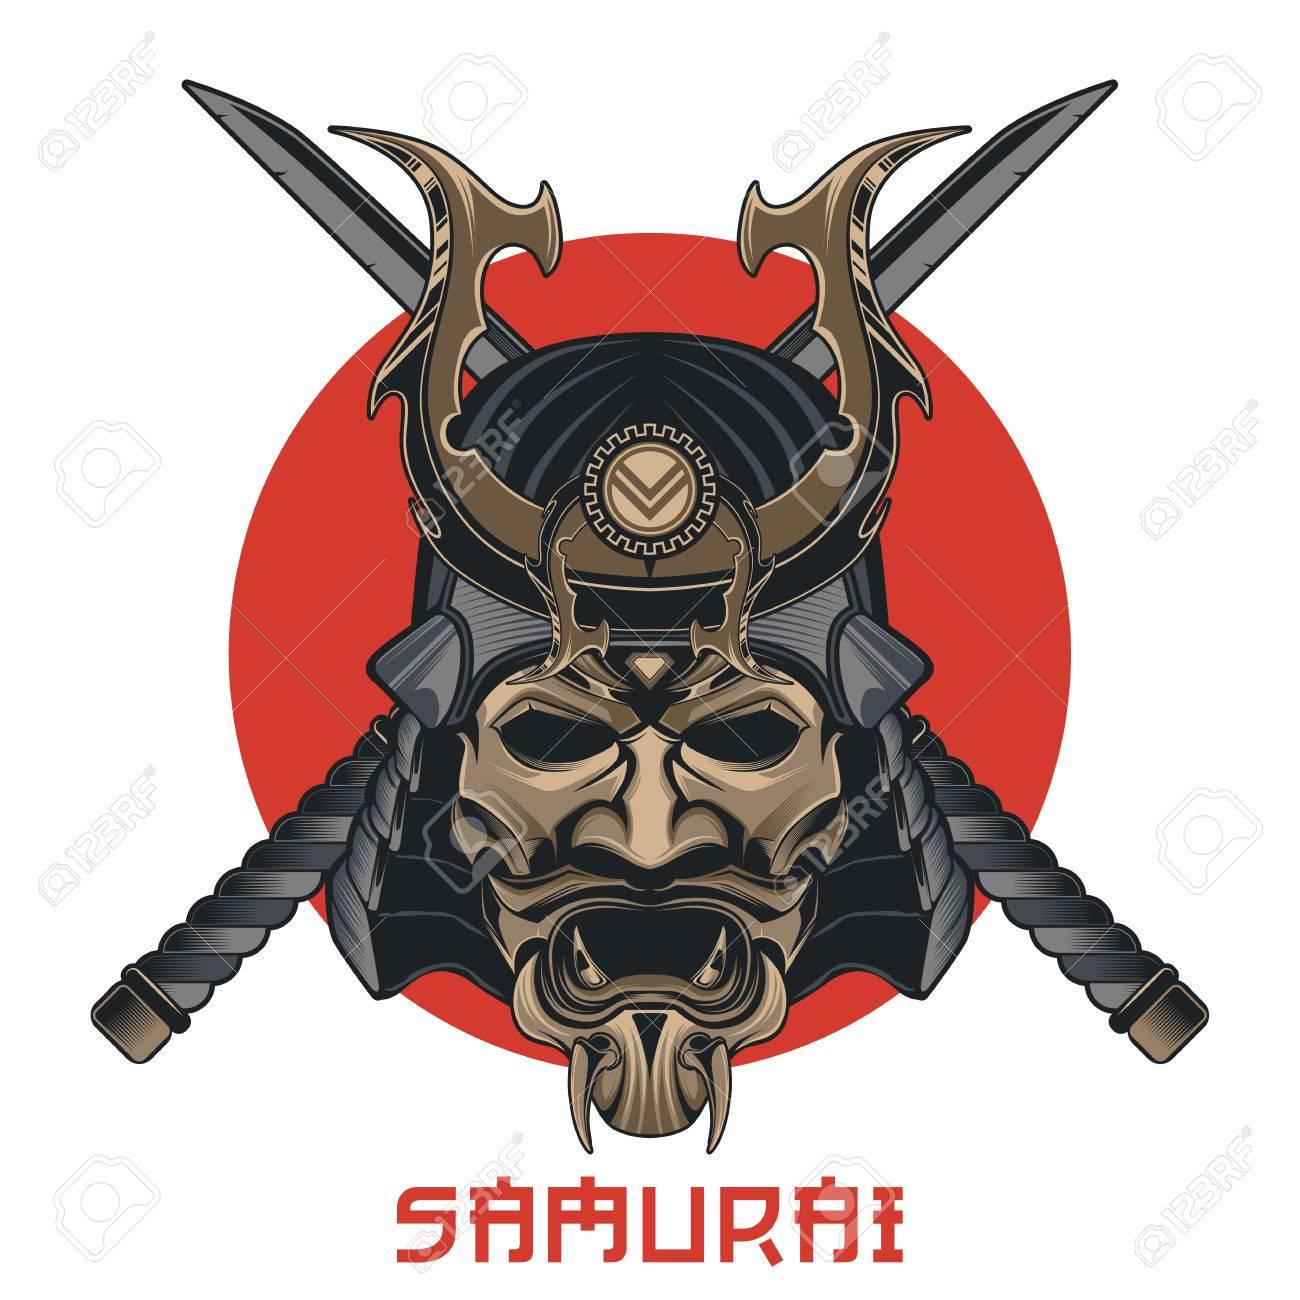 Masque De Samourai Vectoriel Masque Martial Traditionnel Japonais